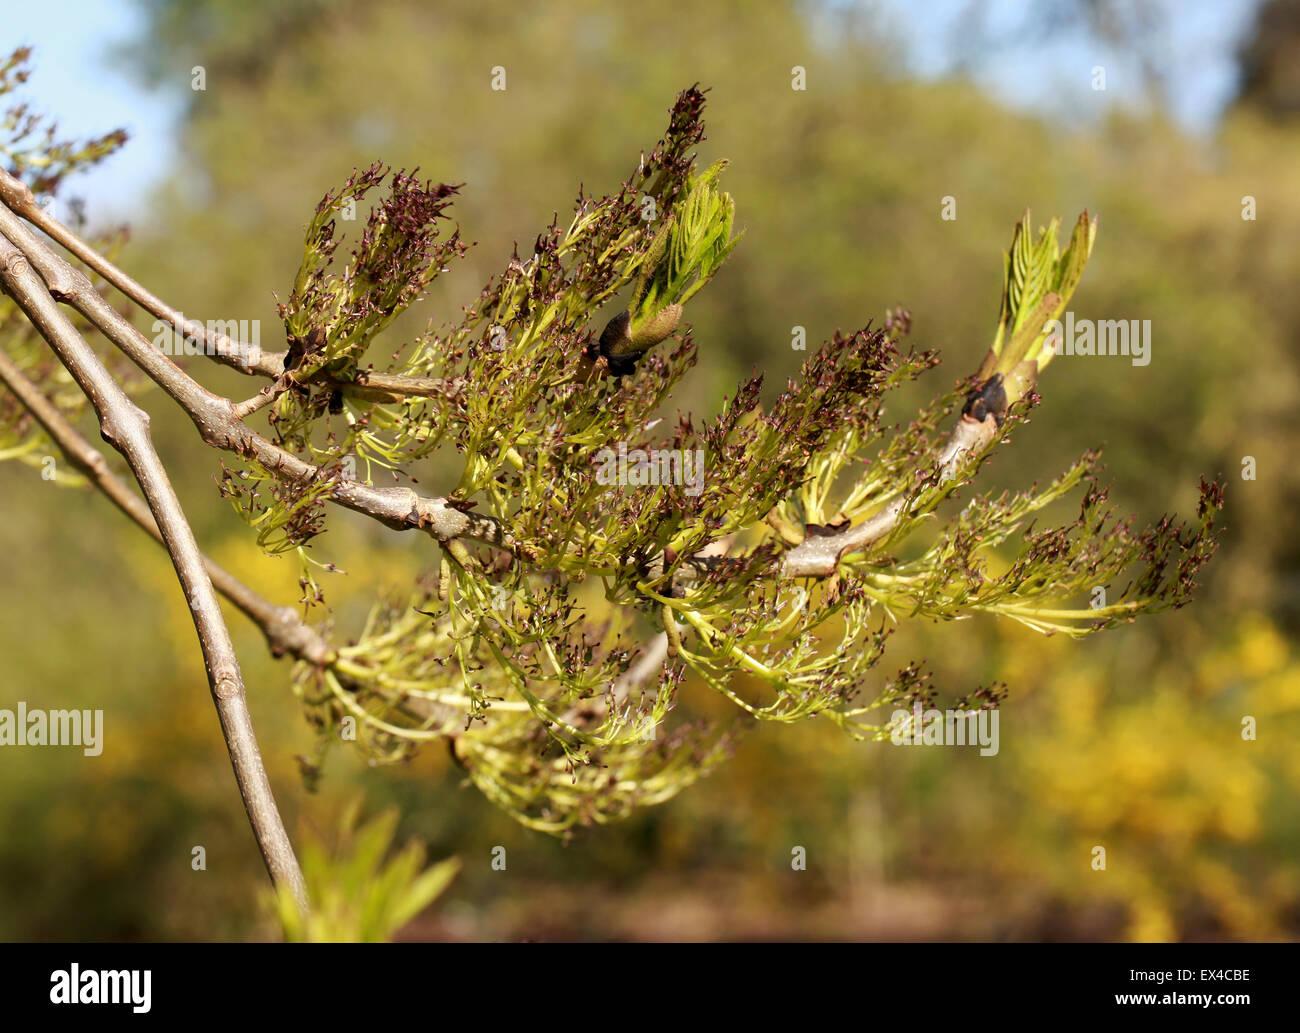 Boccioli e fiori di Wentworth piangendo Frassino Fraxinus exelsior 'Pendula Wentworthii', Oleaceae | Piante Immagini Stock